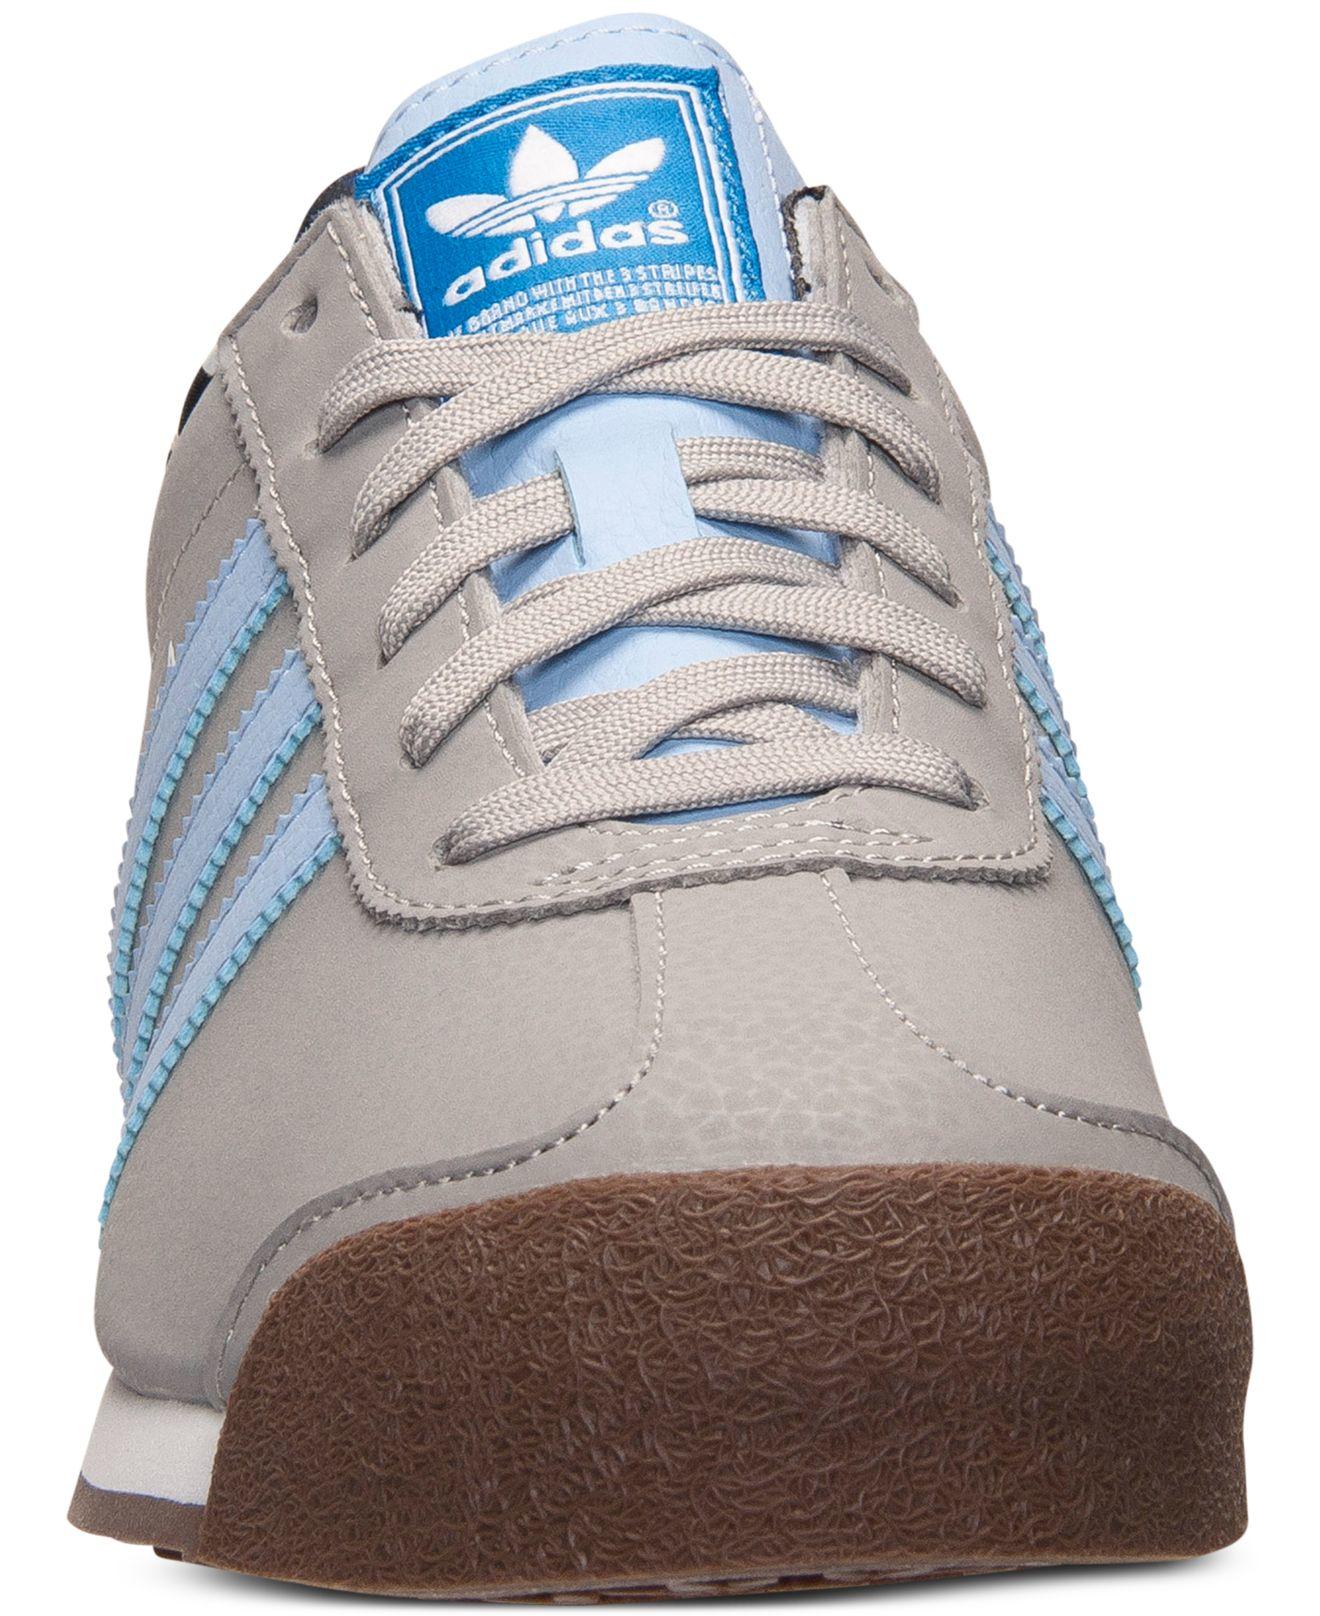 adidas samoa women's casual shoes